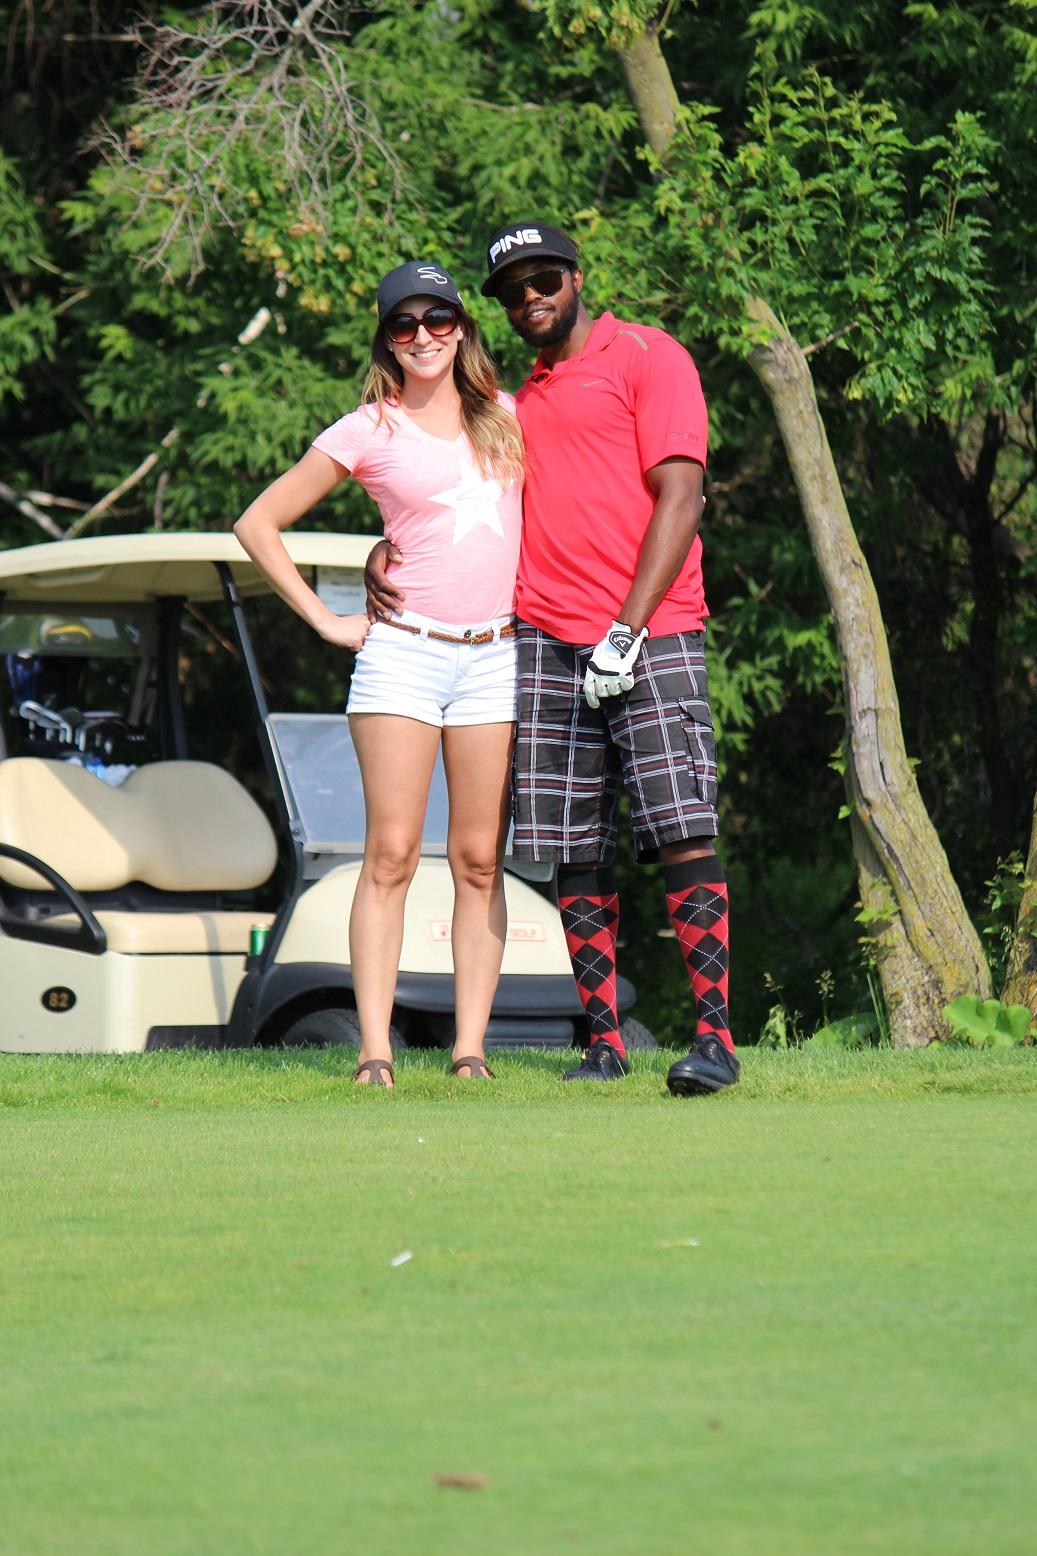 EddieO's Golf guests 48.jpg